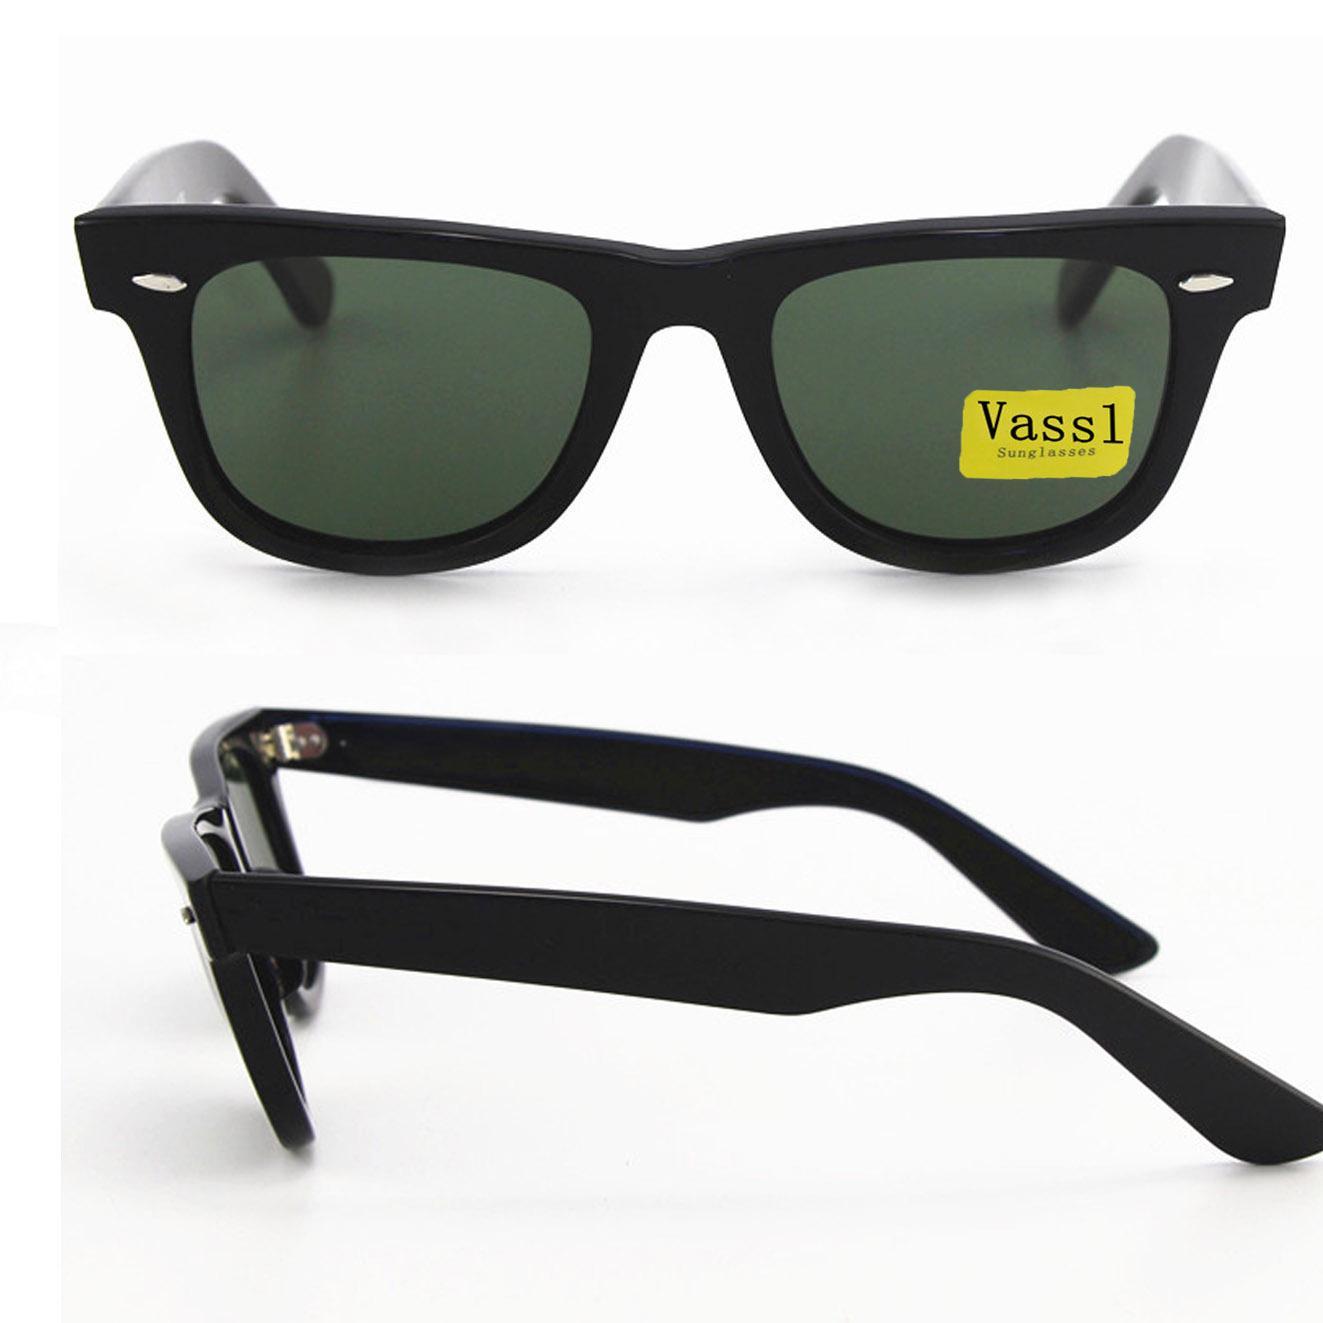 New summer Western Style Women Vassl Sunglasses Retro big angle Black frame green Plank Men Sun glasses 50mm len UV400 with box